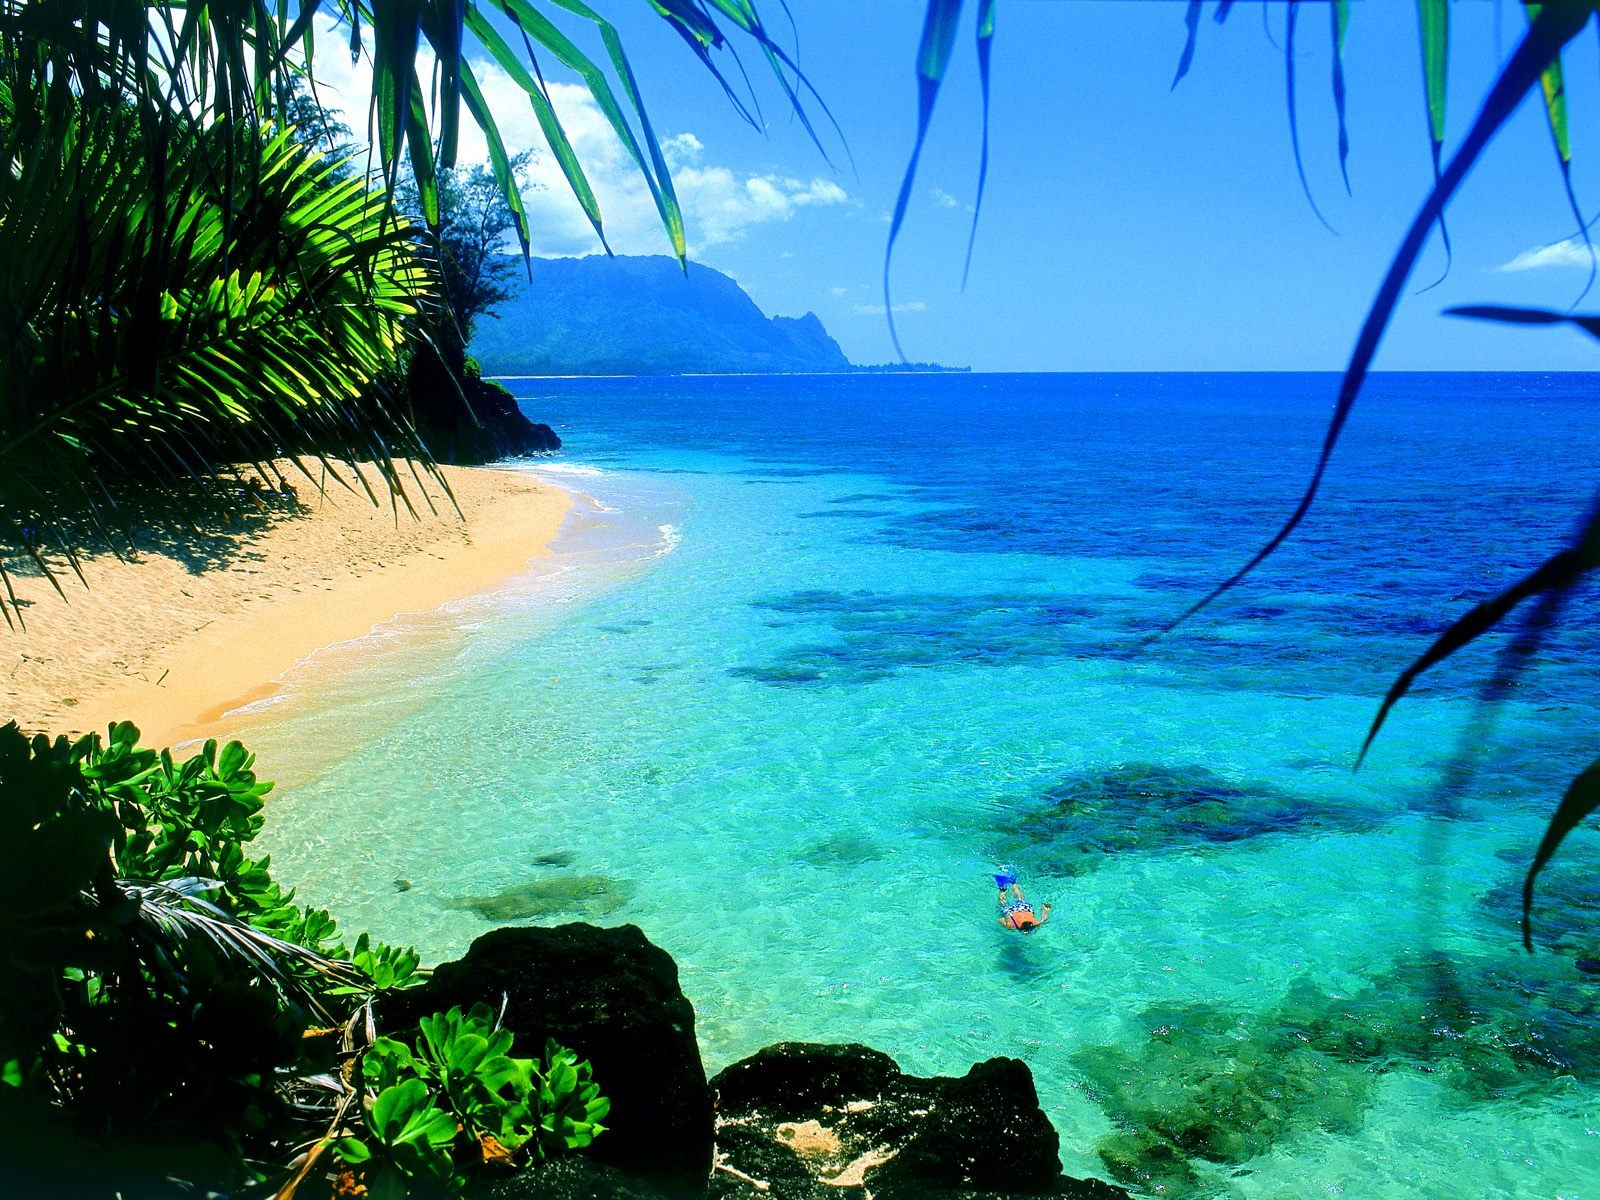 Beau Paysage De Hawaii Fond D'écran #39